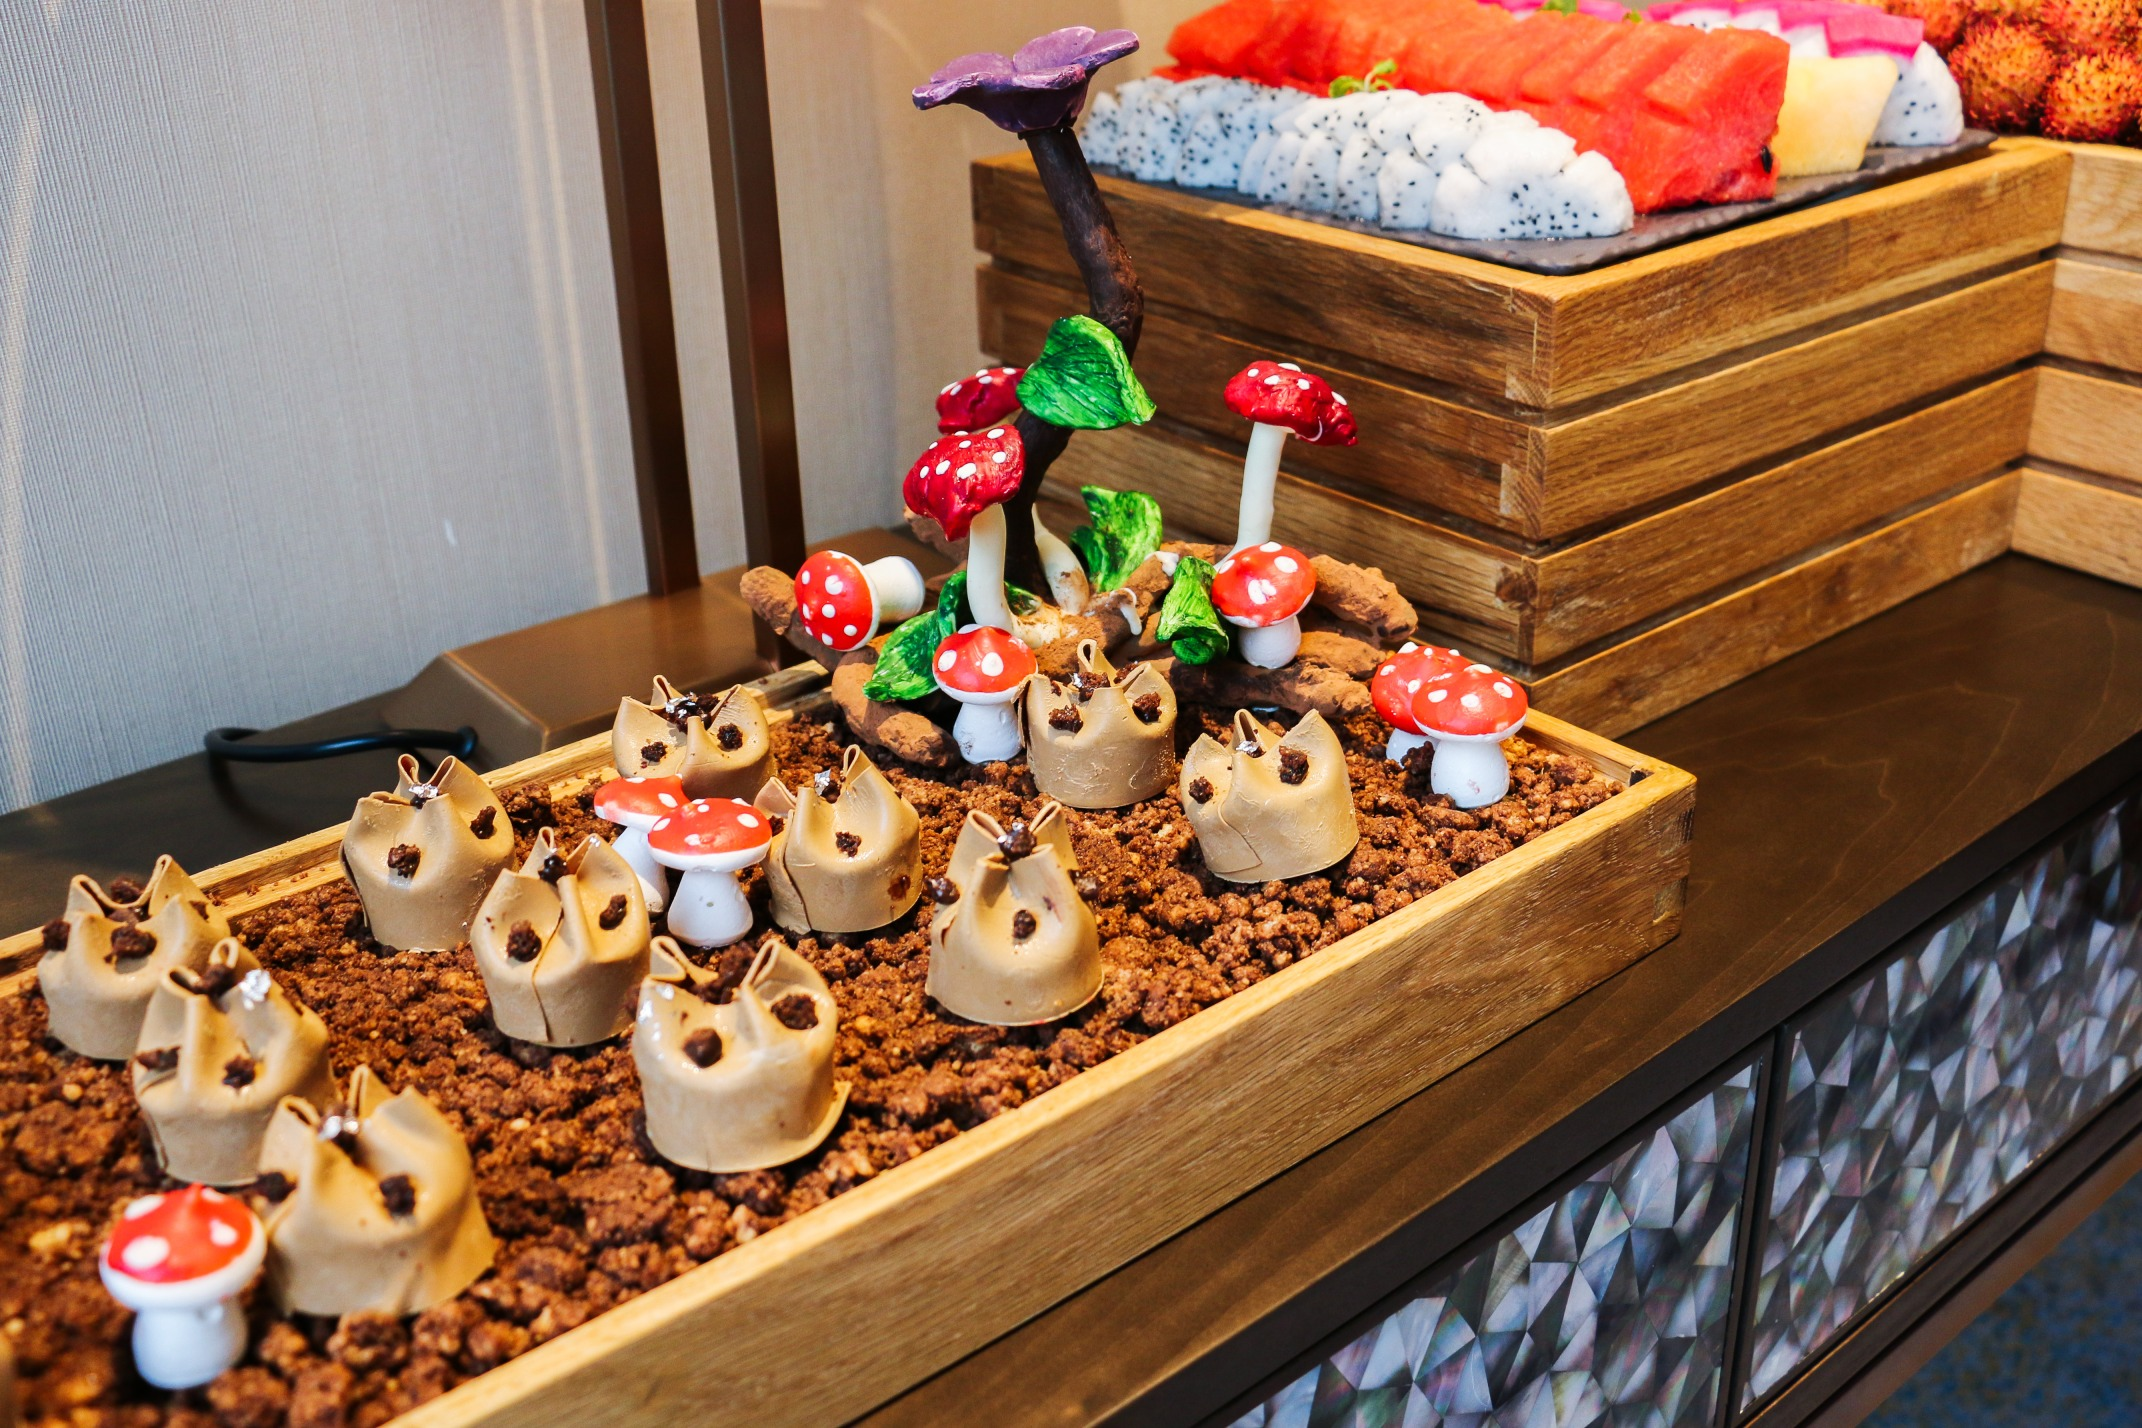 coffee break at hanoi 5 star luxury hotel